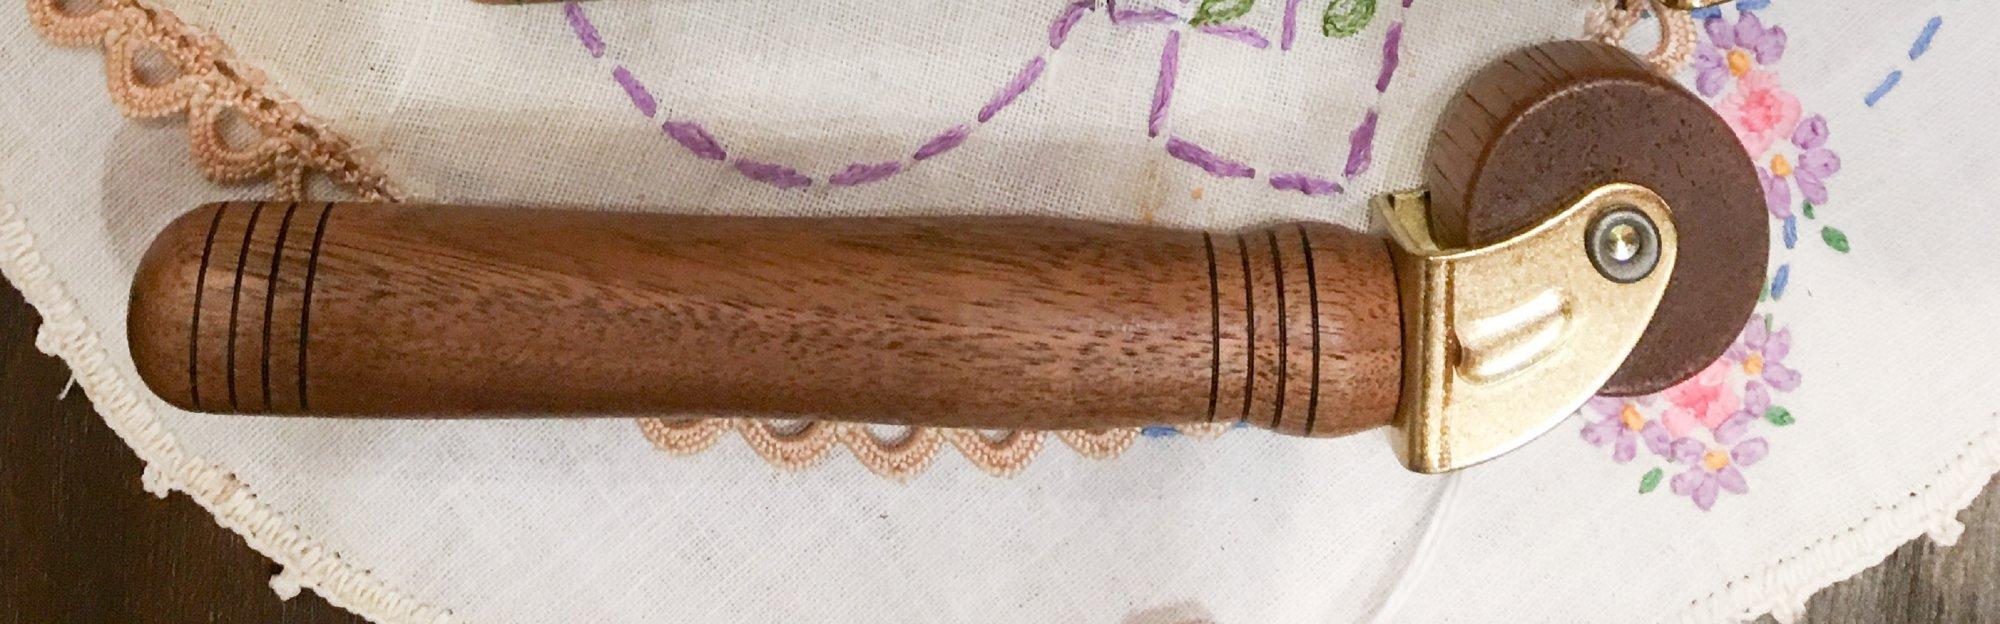 Wood Seam Roller - Hickory